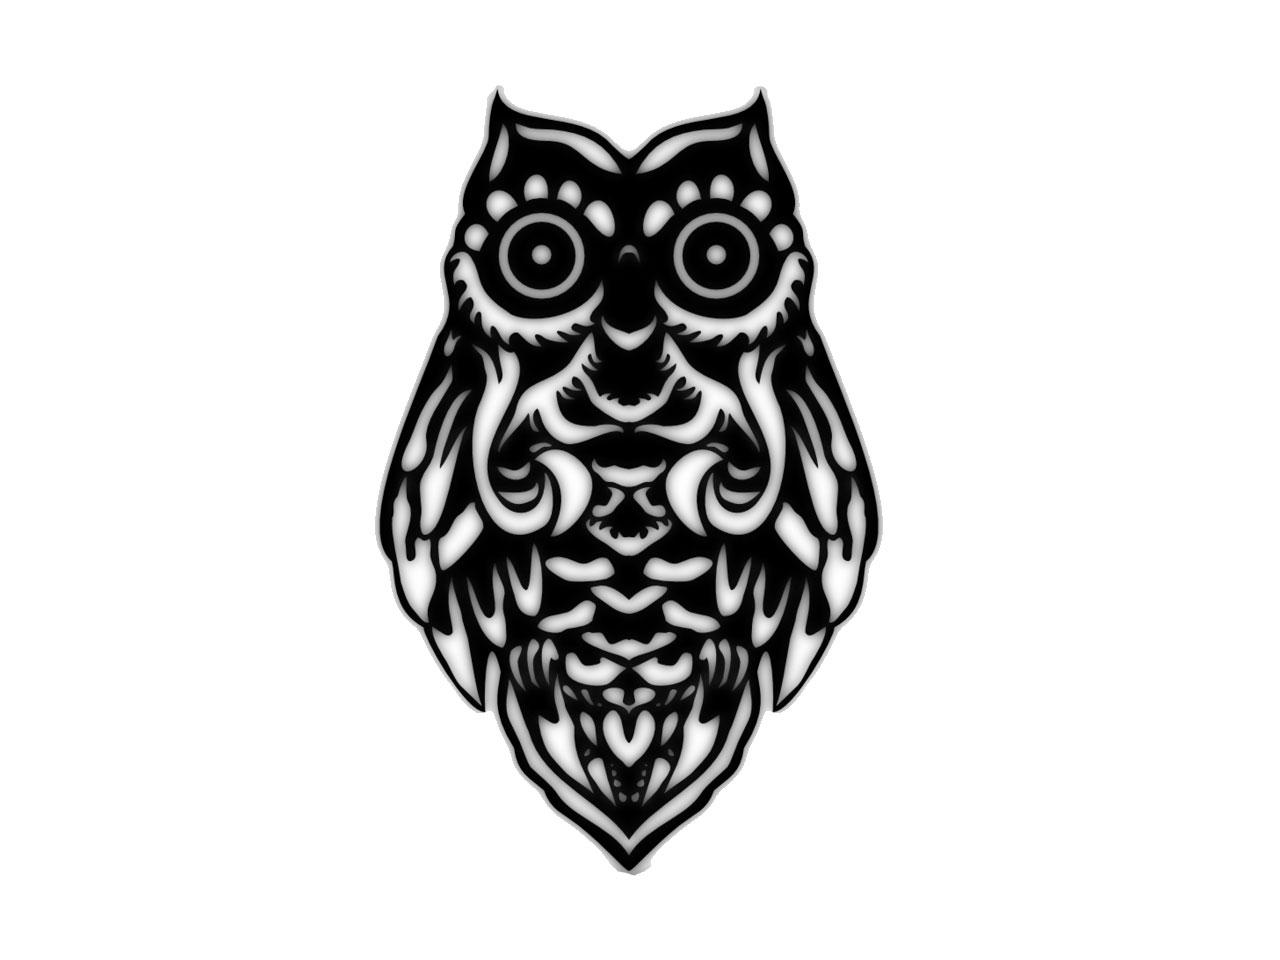 Drawn owl tribal #15